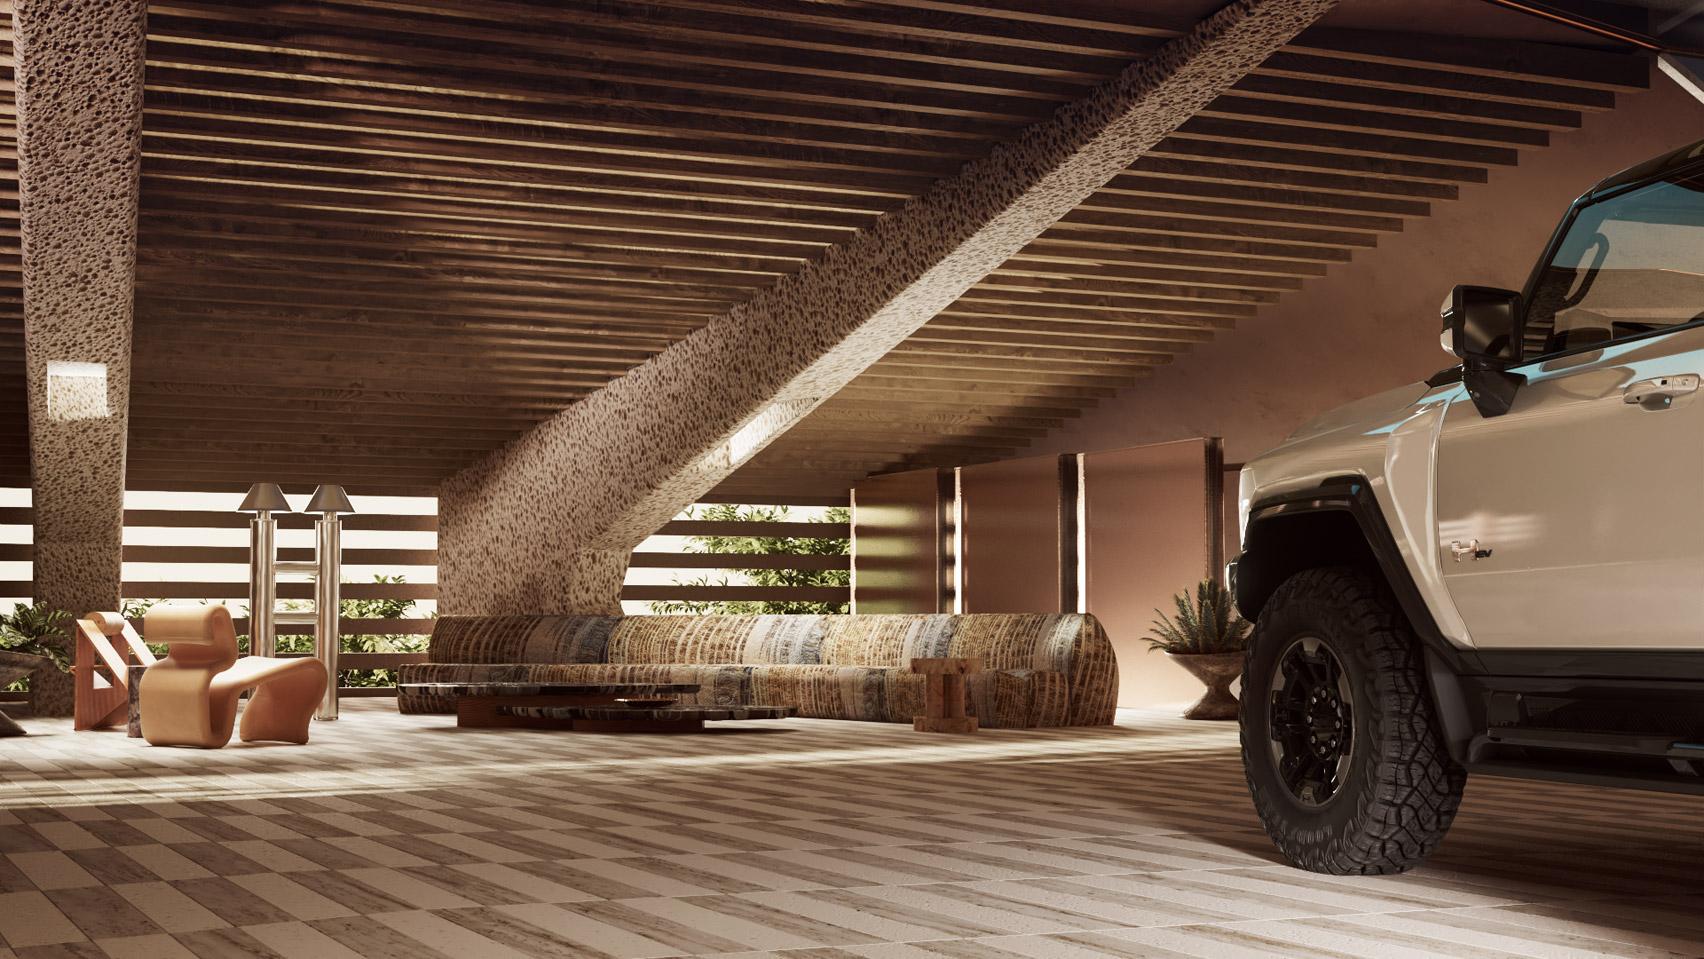 Virtual furniture in the Hummer EV garage